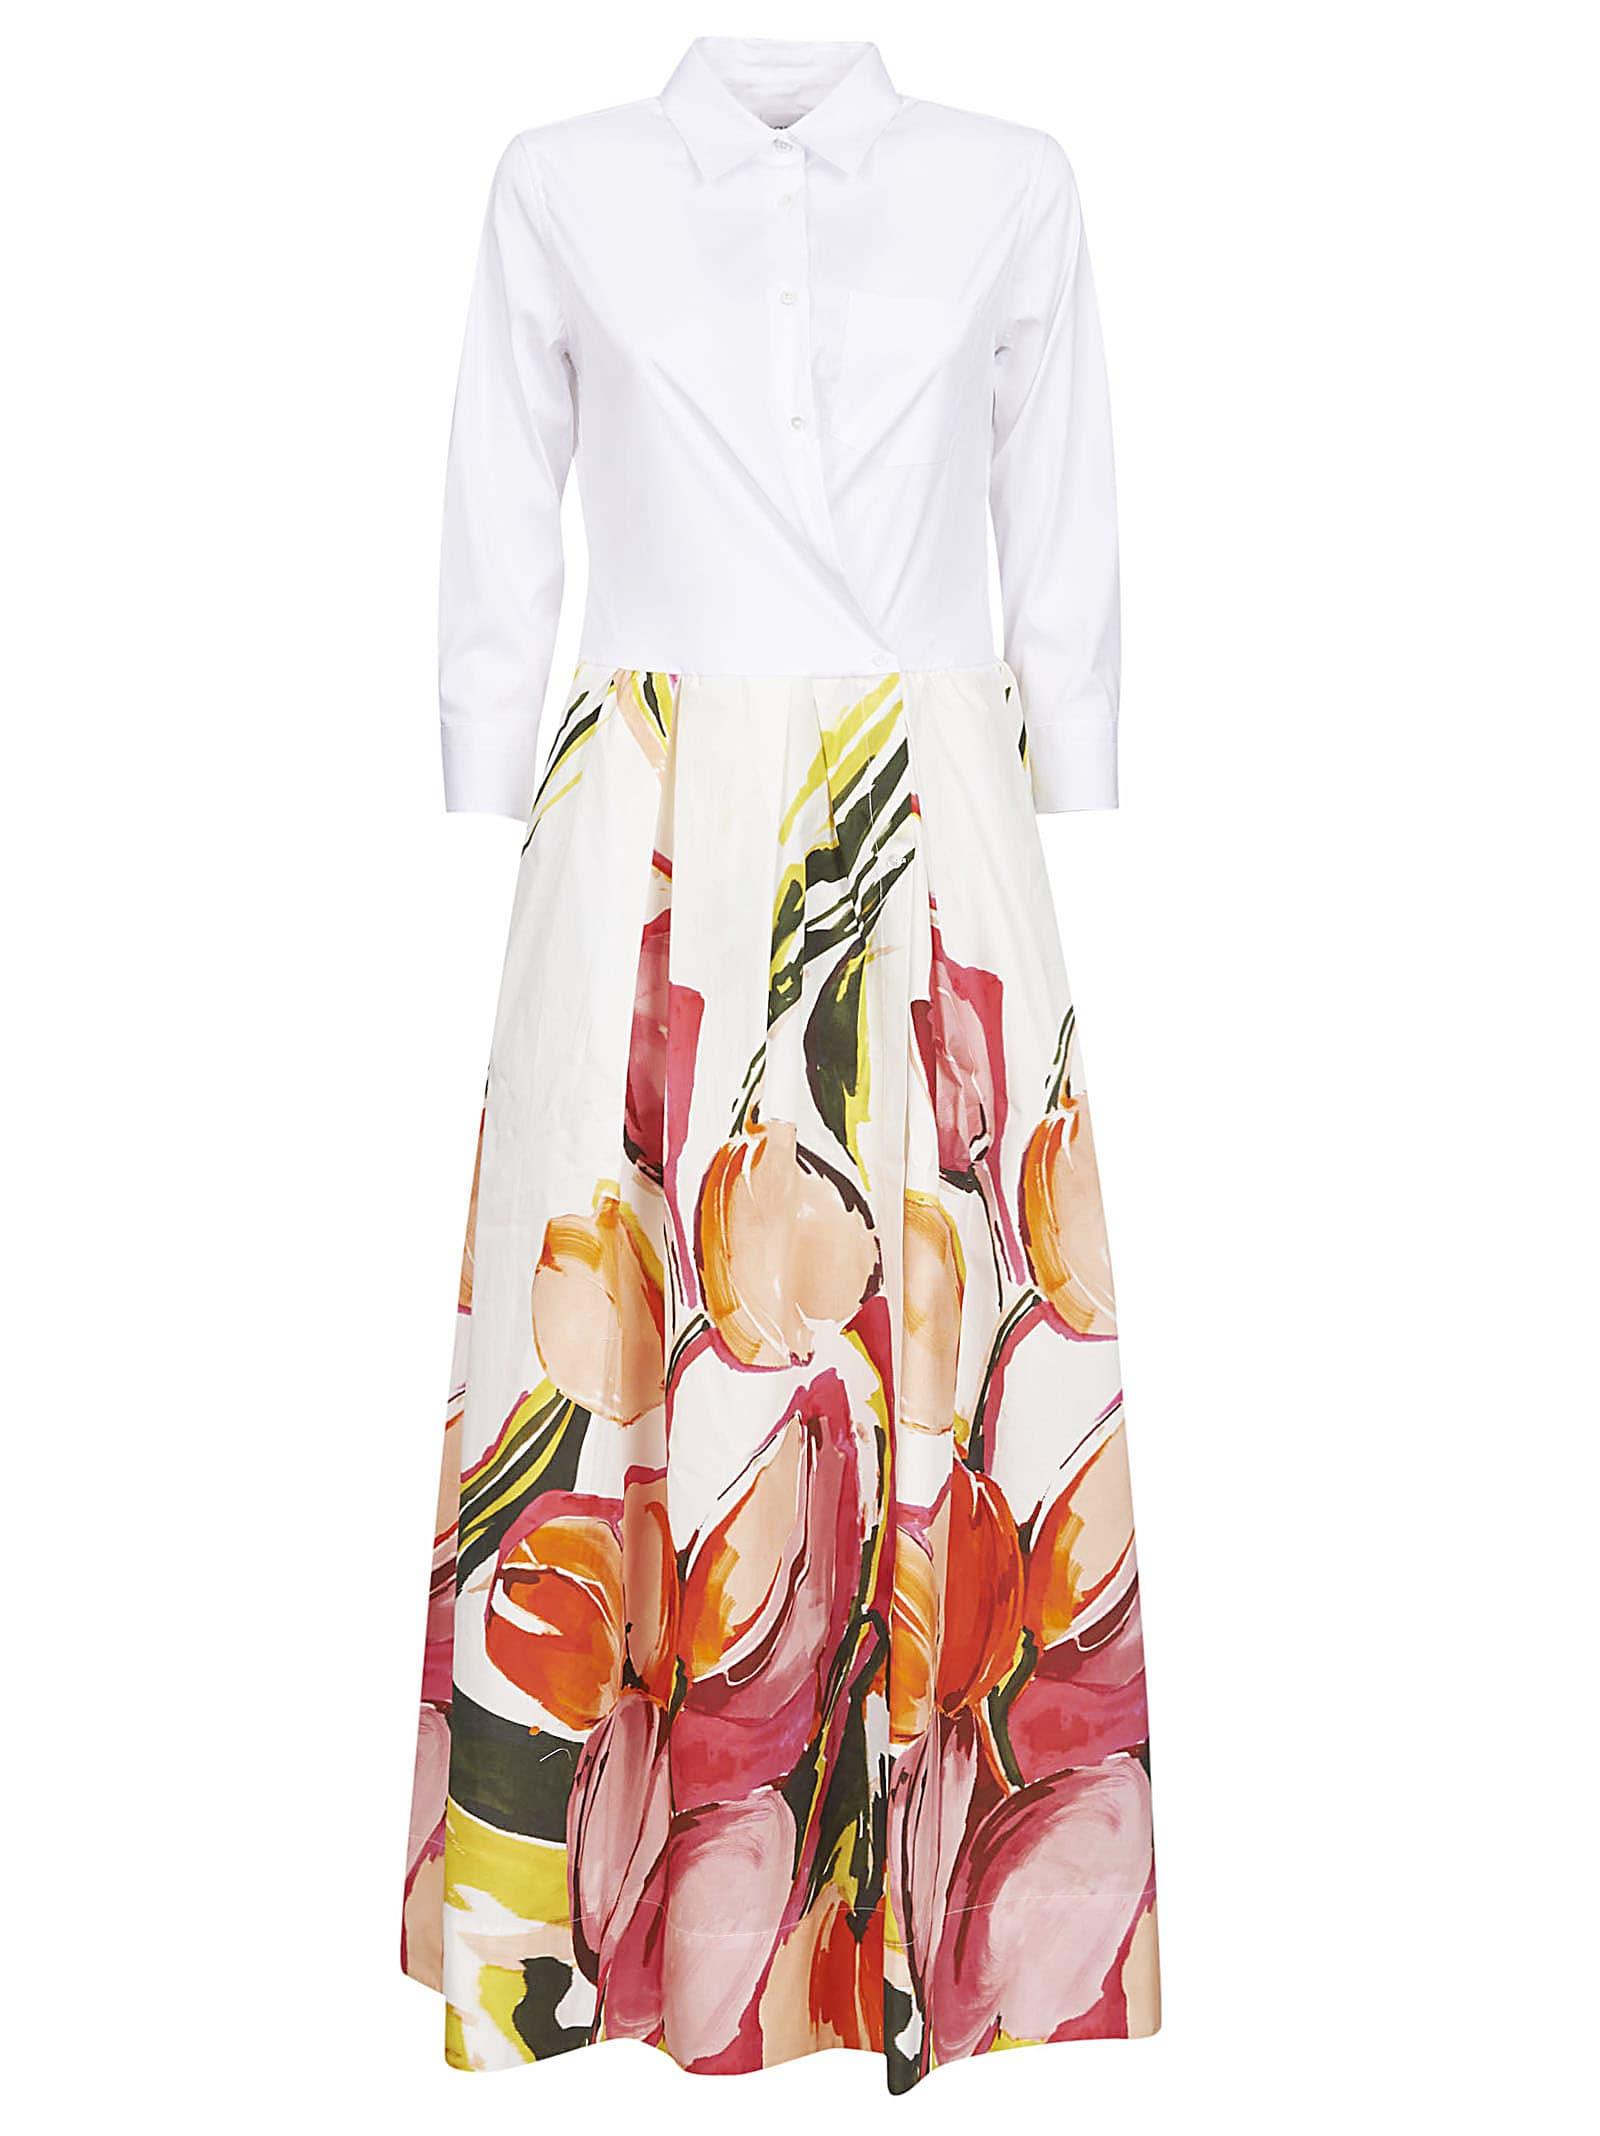 Buy Sara Roka Floral Print Pleated Shirt Dress online, shop Sara Roka with free shipping